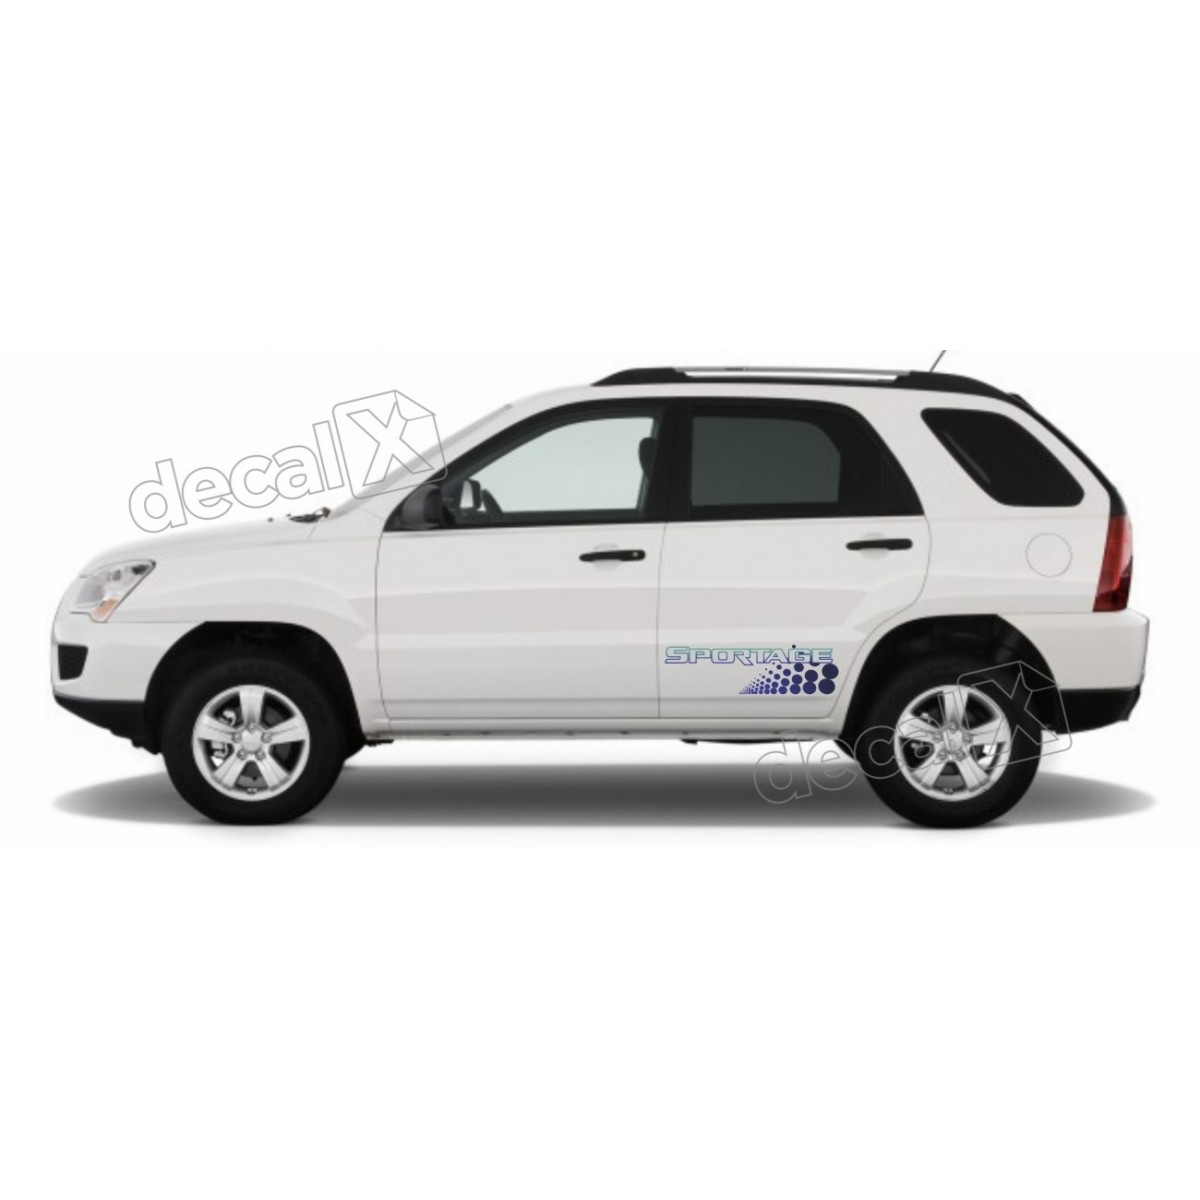 Adesivo Faixa Lateral Fiat Palio Sporting Racing Spt03